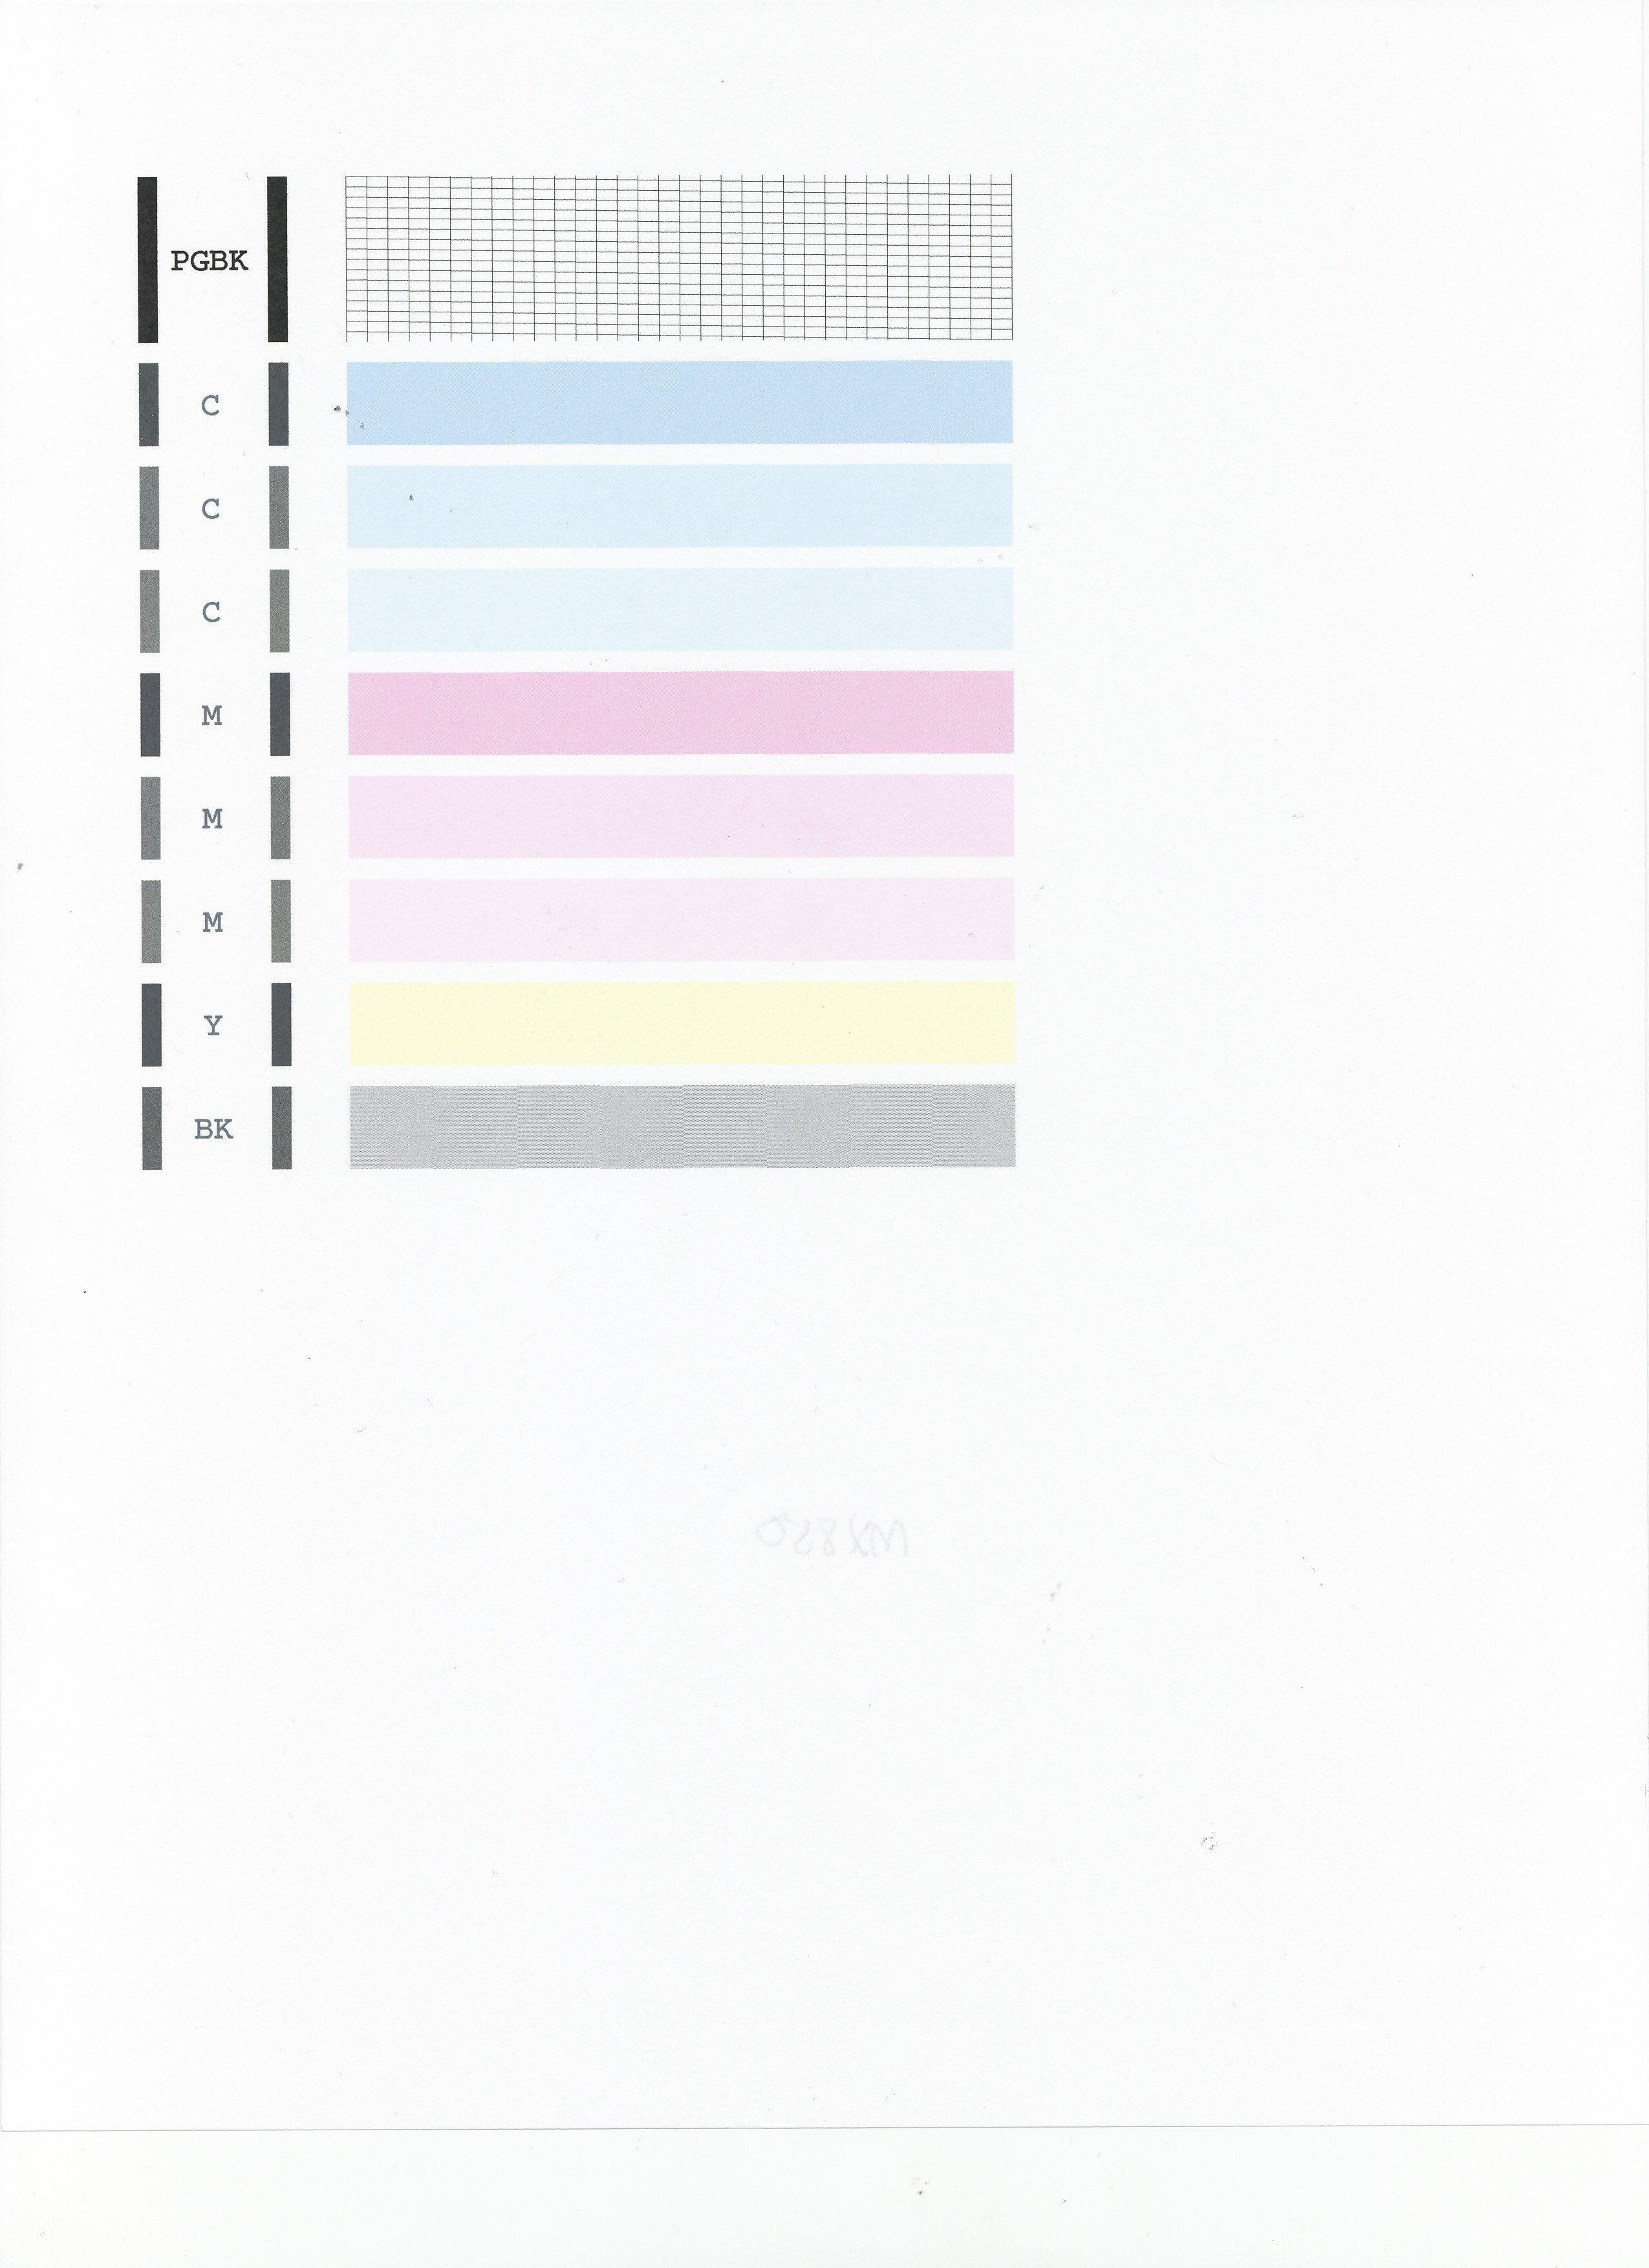 MX922 Nozzle Test.jpg